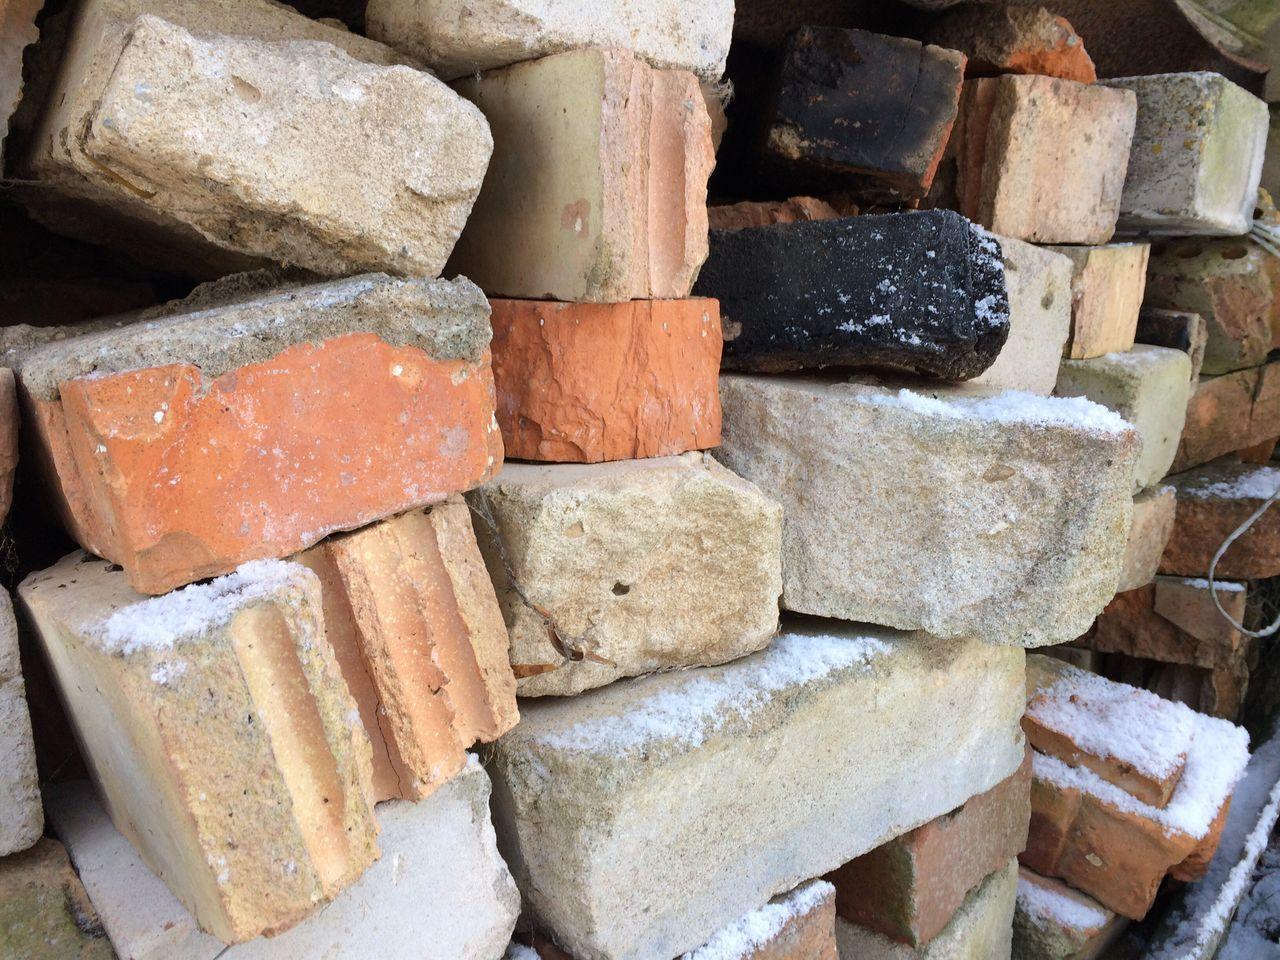 Stack Backgrounds Full Frame Shape No People Sweet Food Close-up Day Outdoors Brick Bricks Brickporn Brickwork  Old